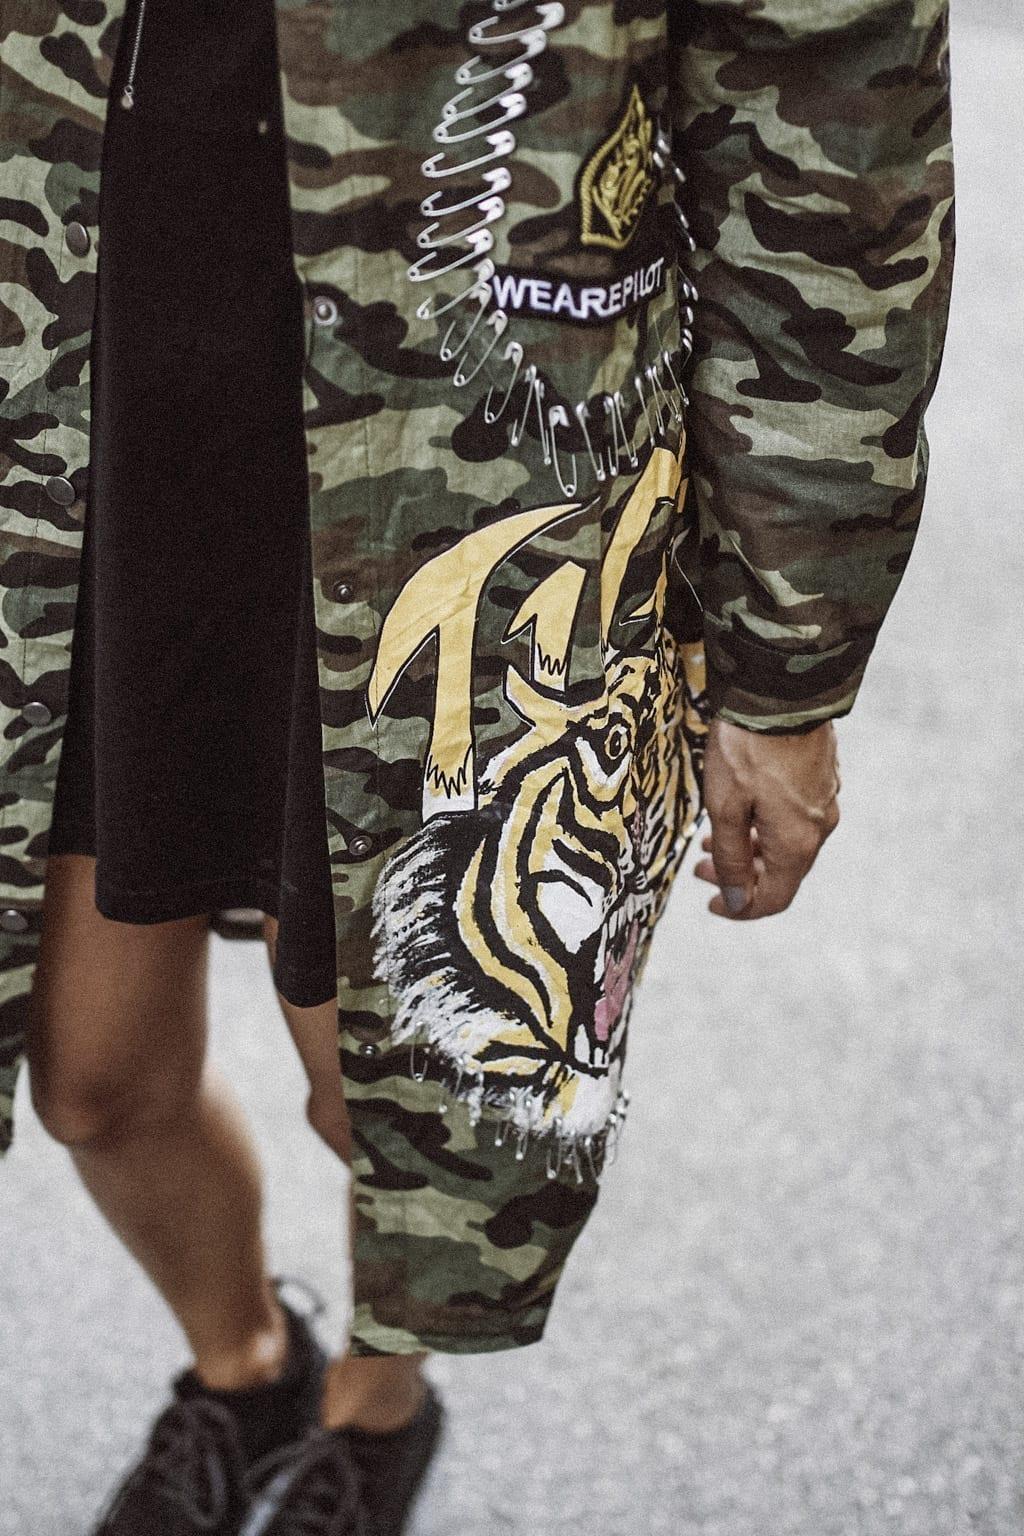 CK-1606_salzburg-fashion-street-style-look-magazine-karin-kaswurm-electric-love-2016-festival-camouflage-military-jacket-8956